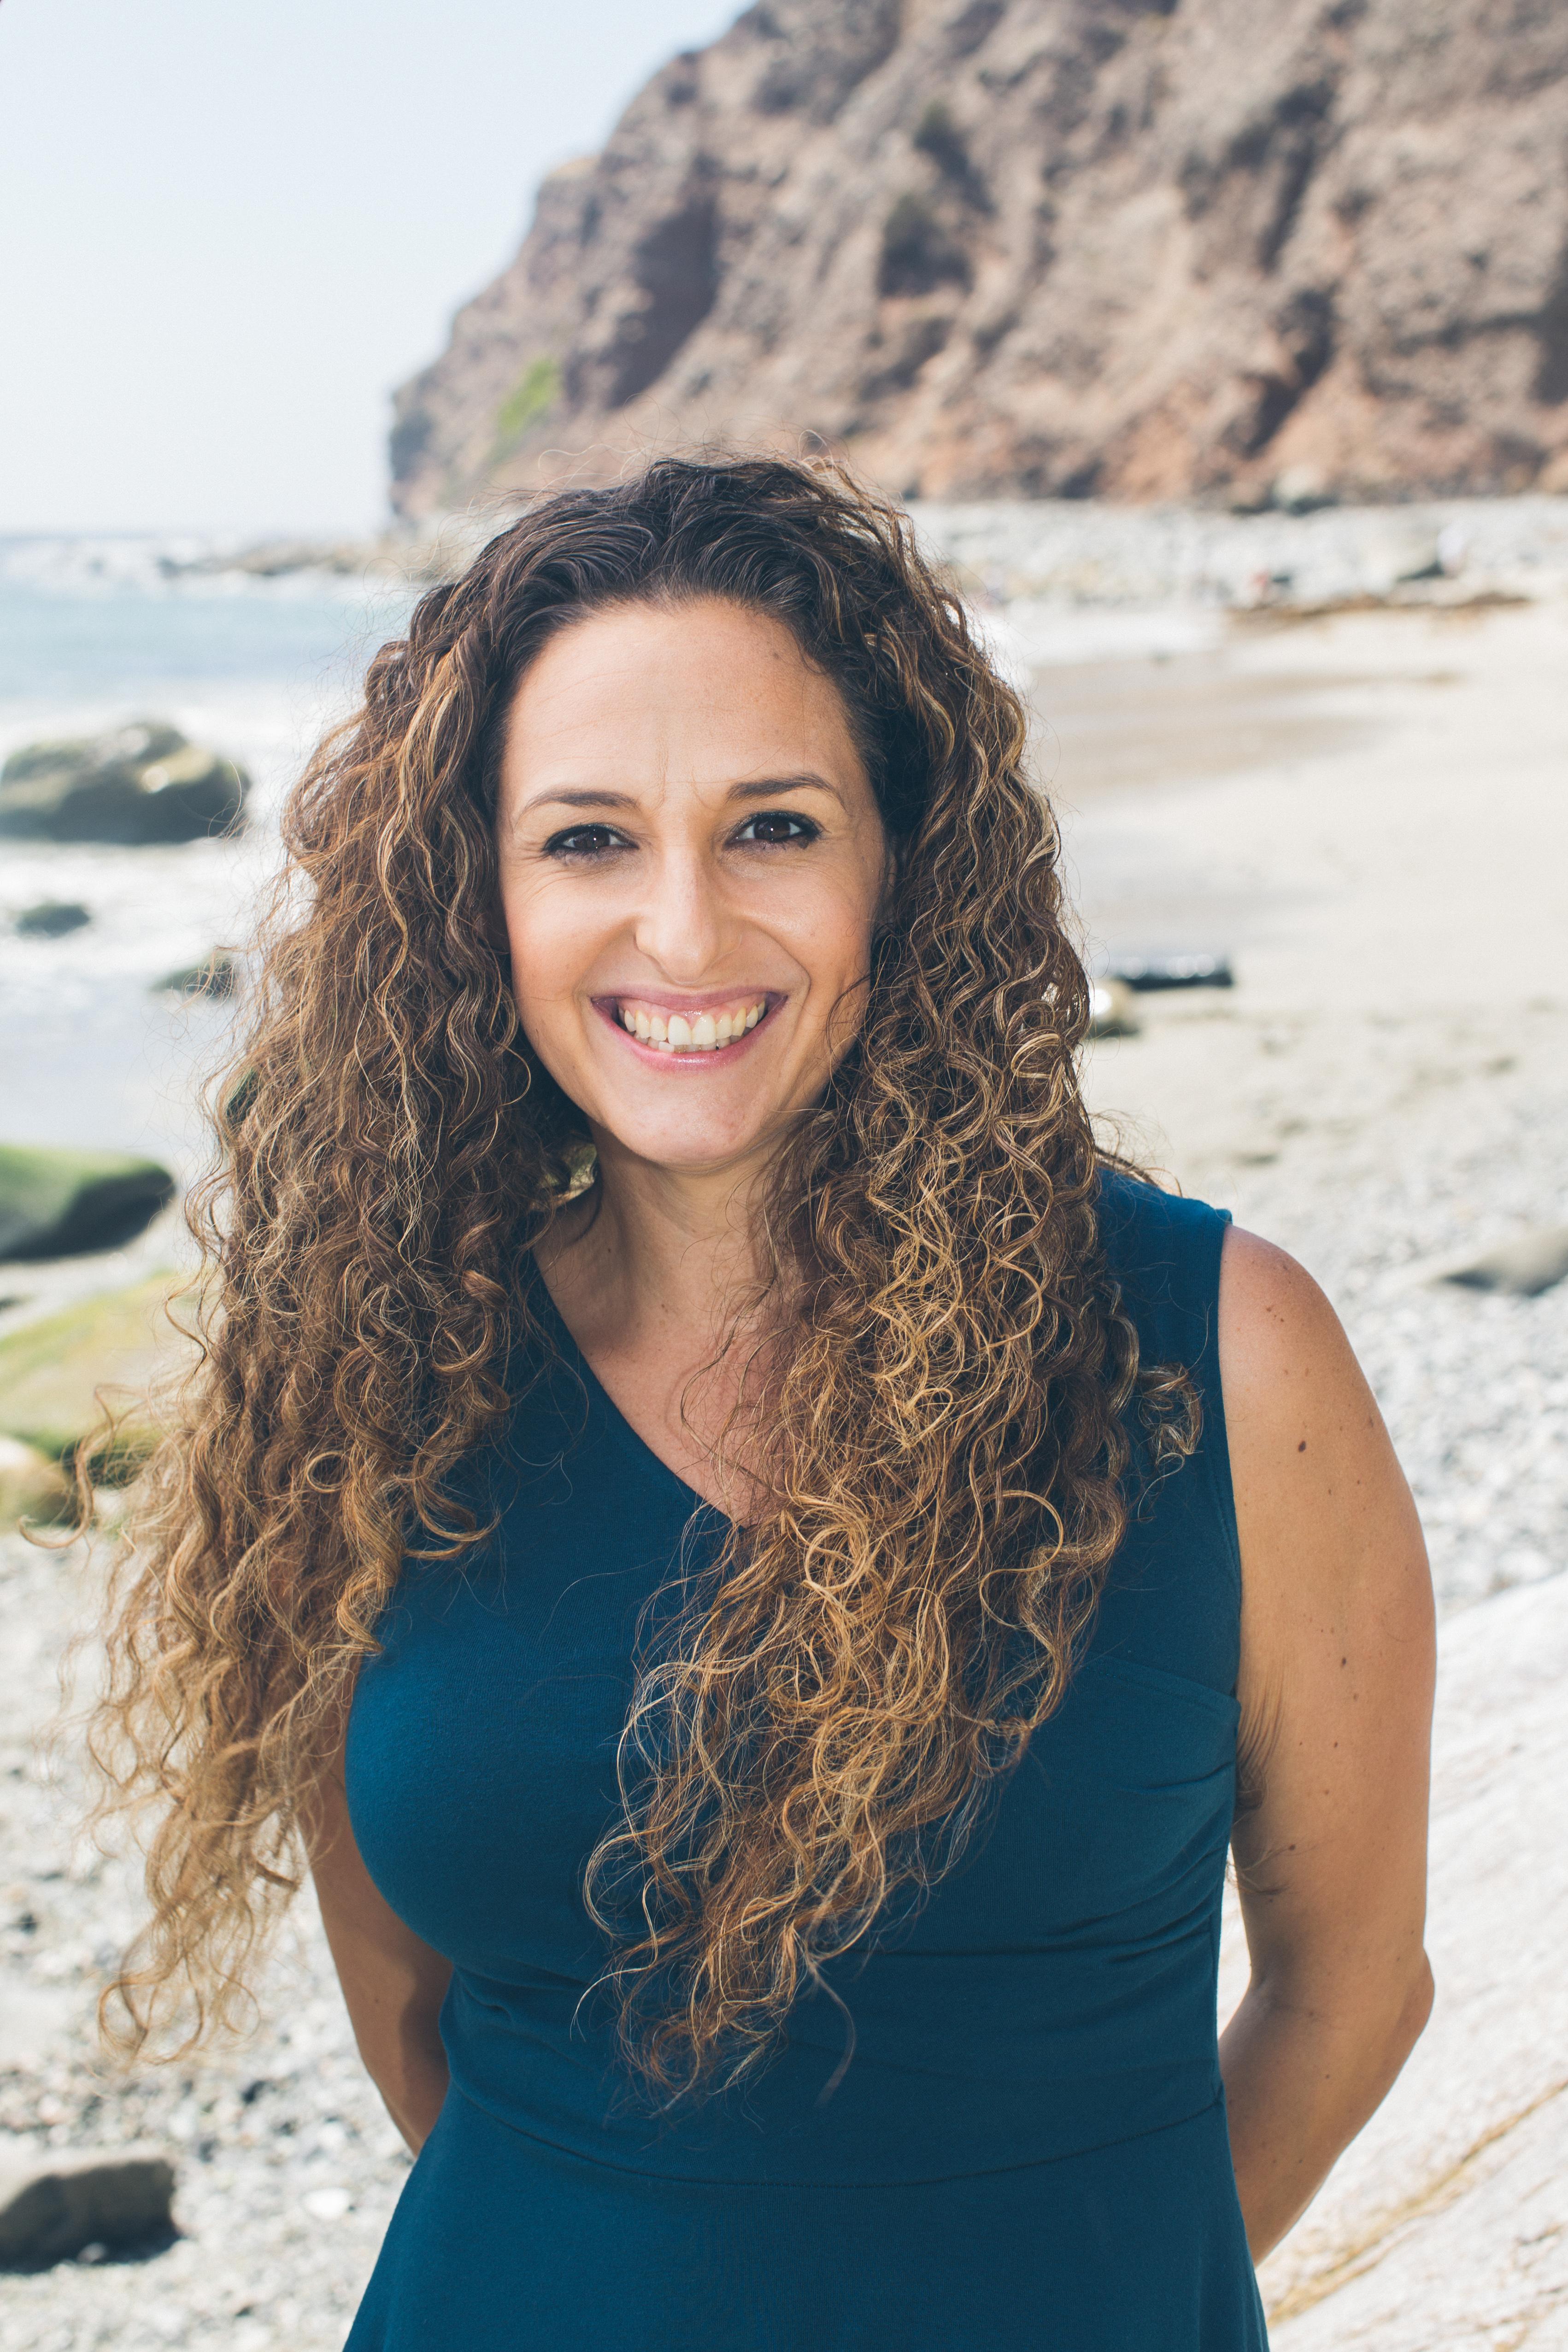 Kelly Ayoub